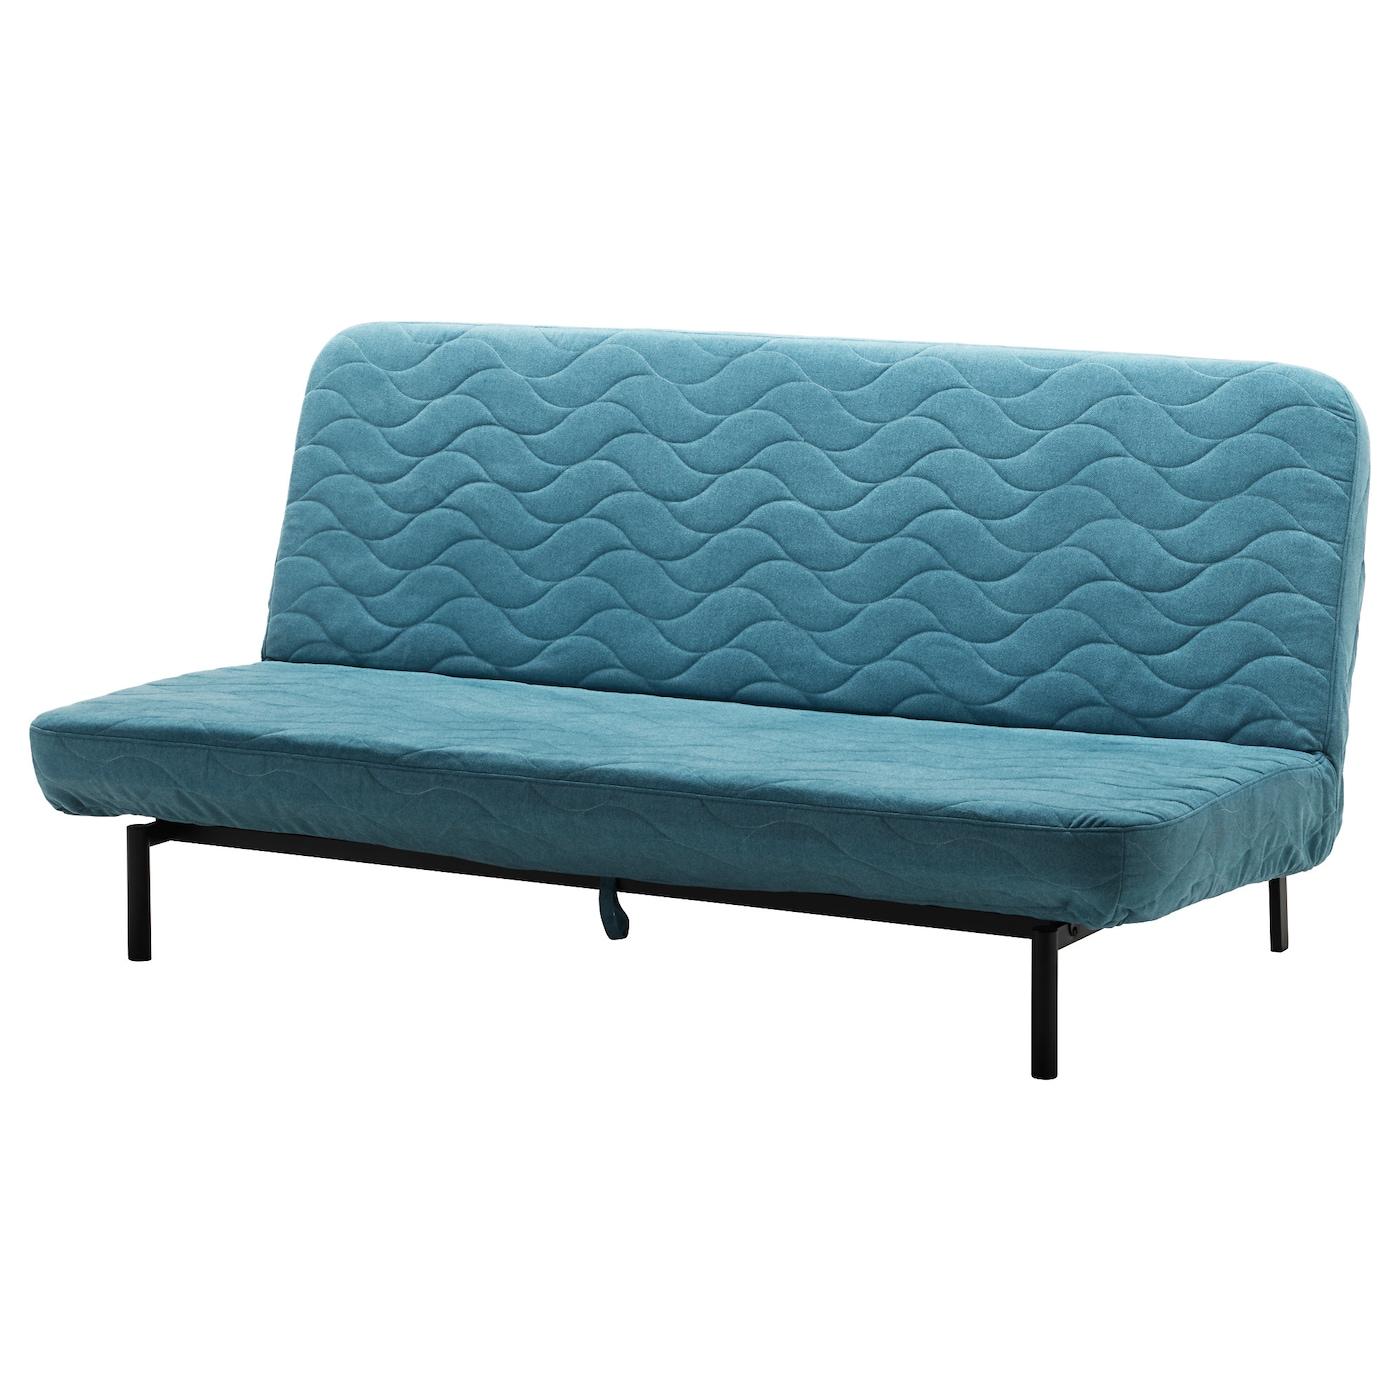 Nyhamn 3 Seat Sofa Bed With Pocket Spring Mattress Borred